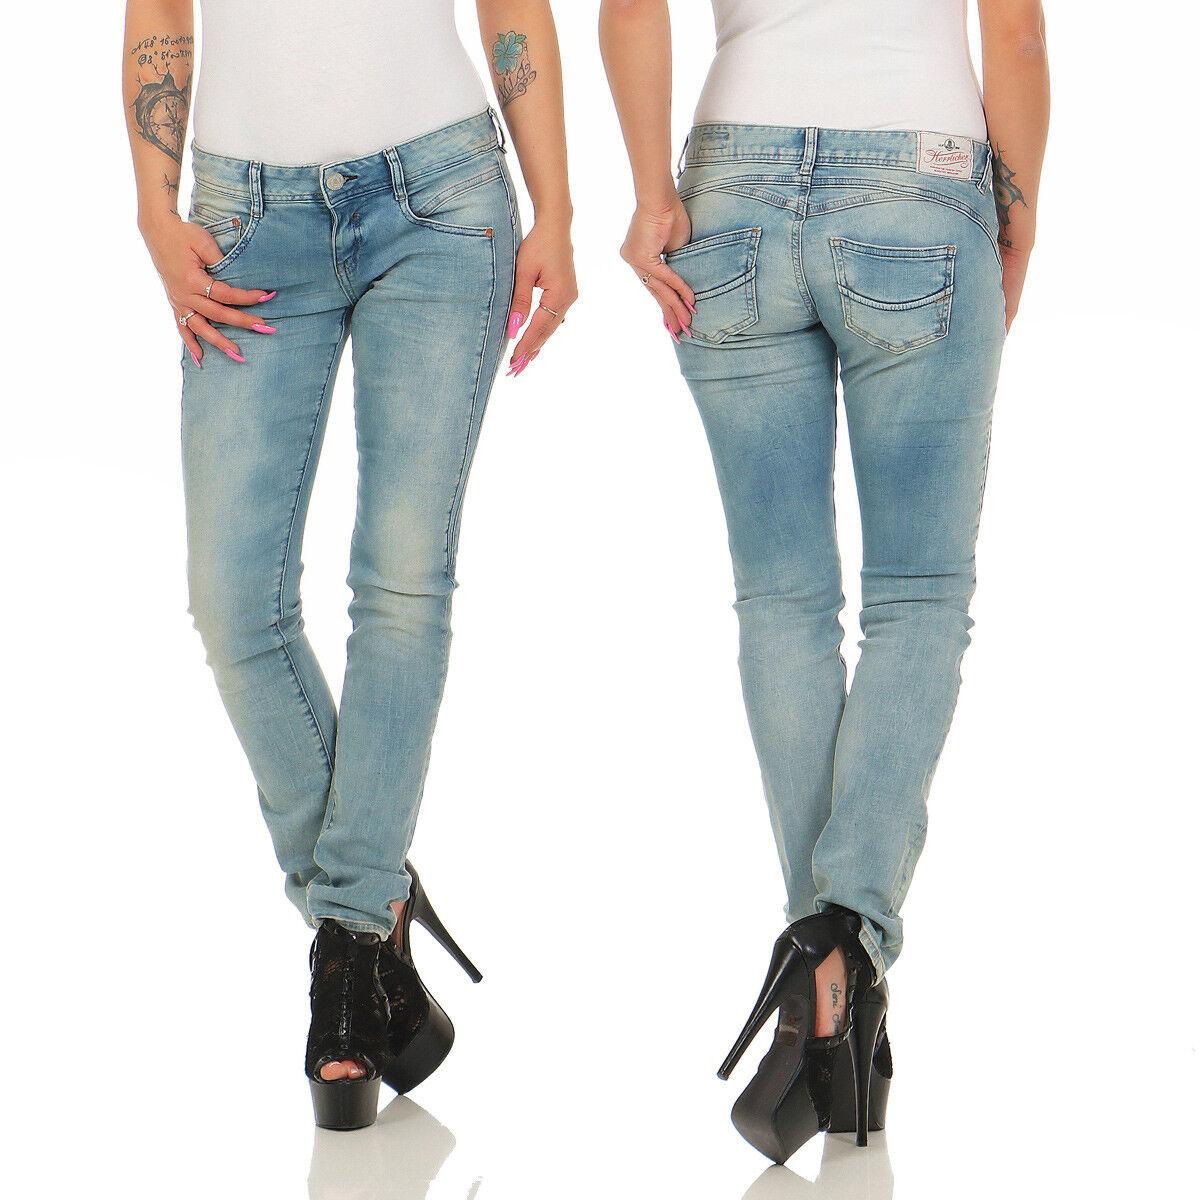 HERRLICHER - GILA Slim Powerstretch - D9060 042 - Damen Jeans Hose - NEU